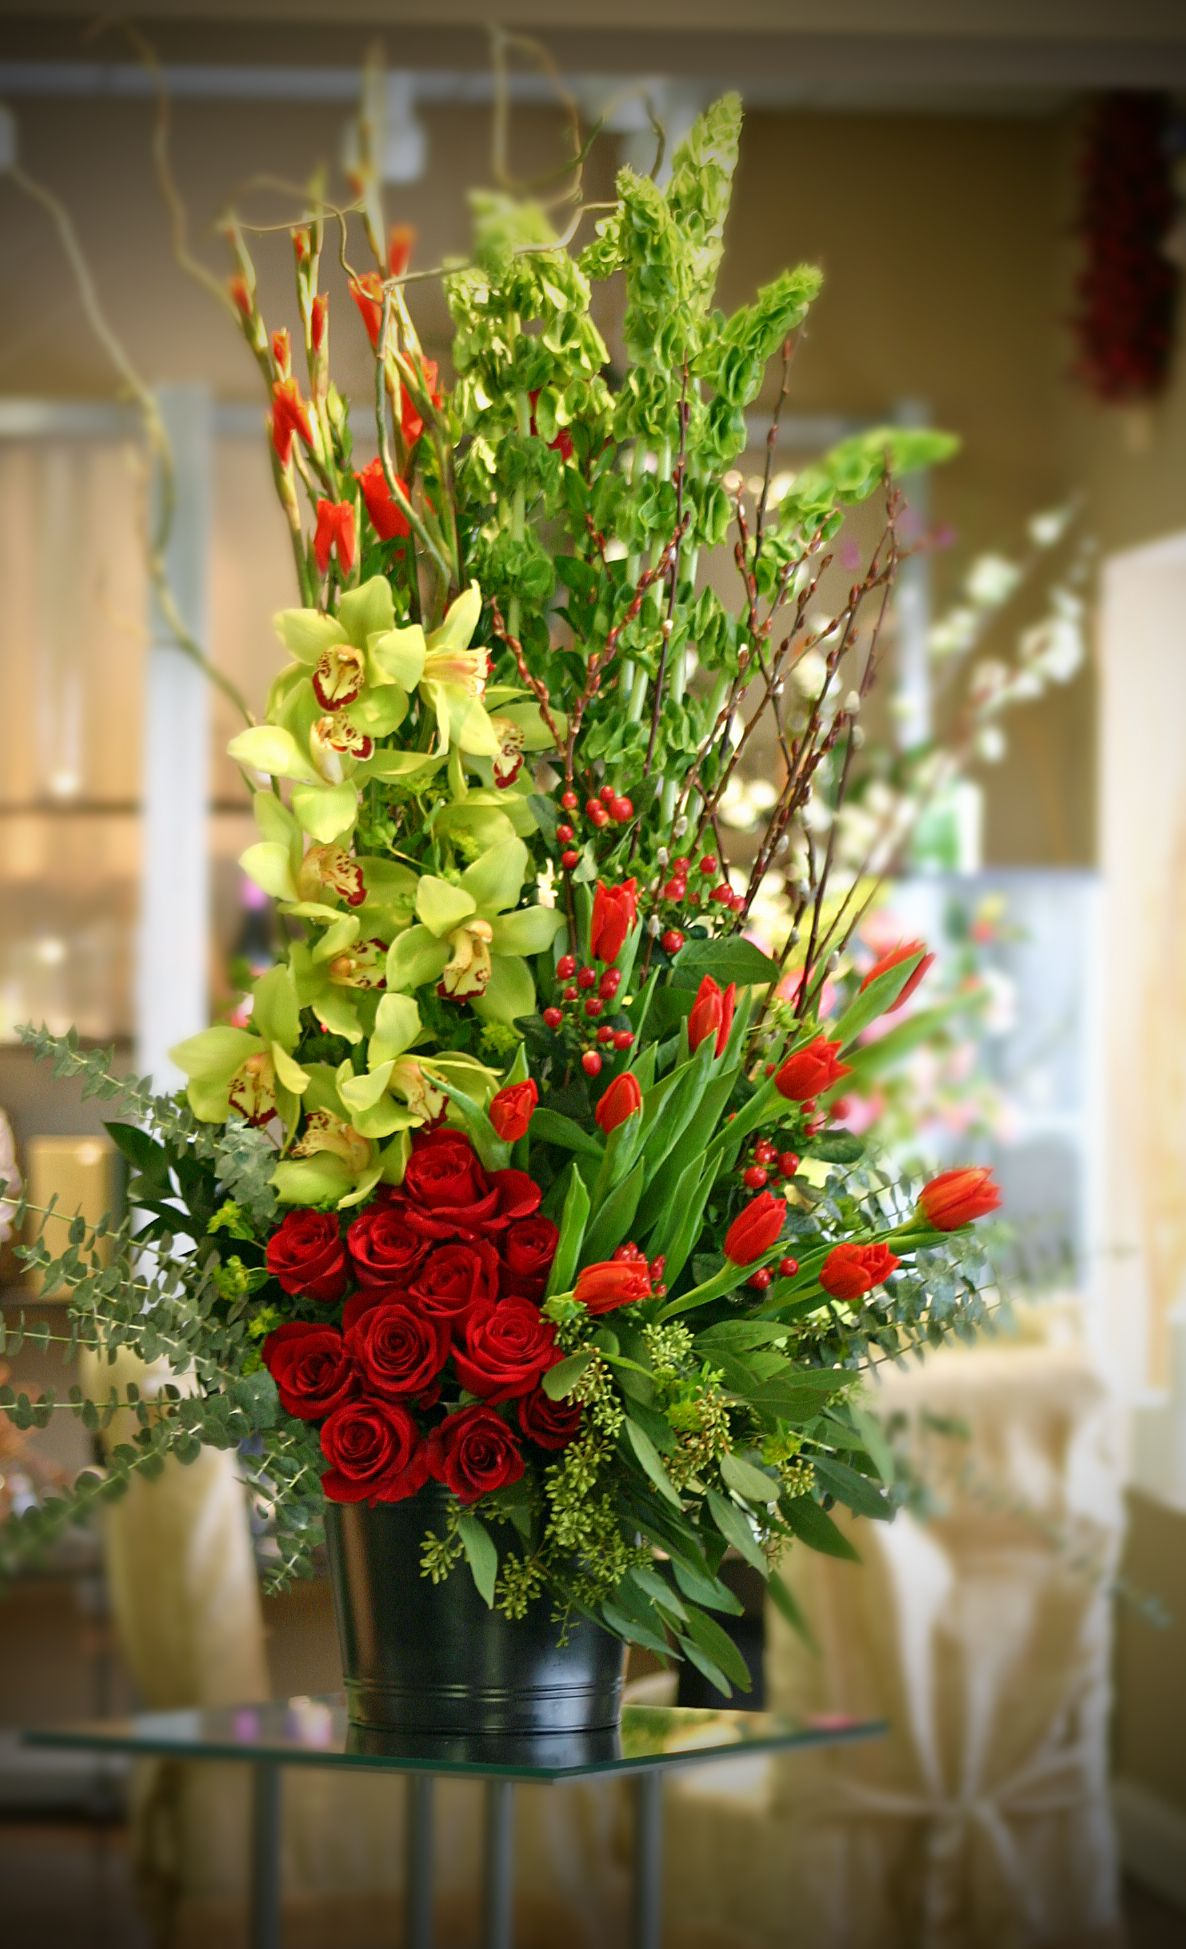 flower subscription service ireland